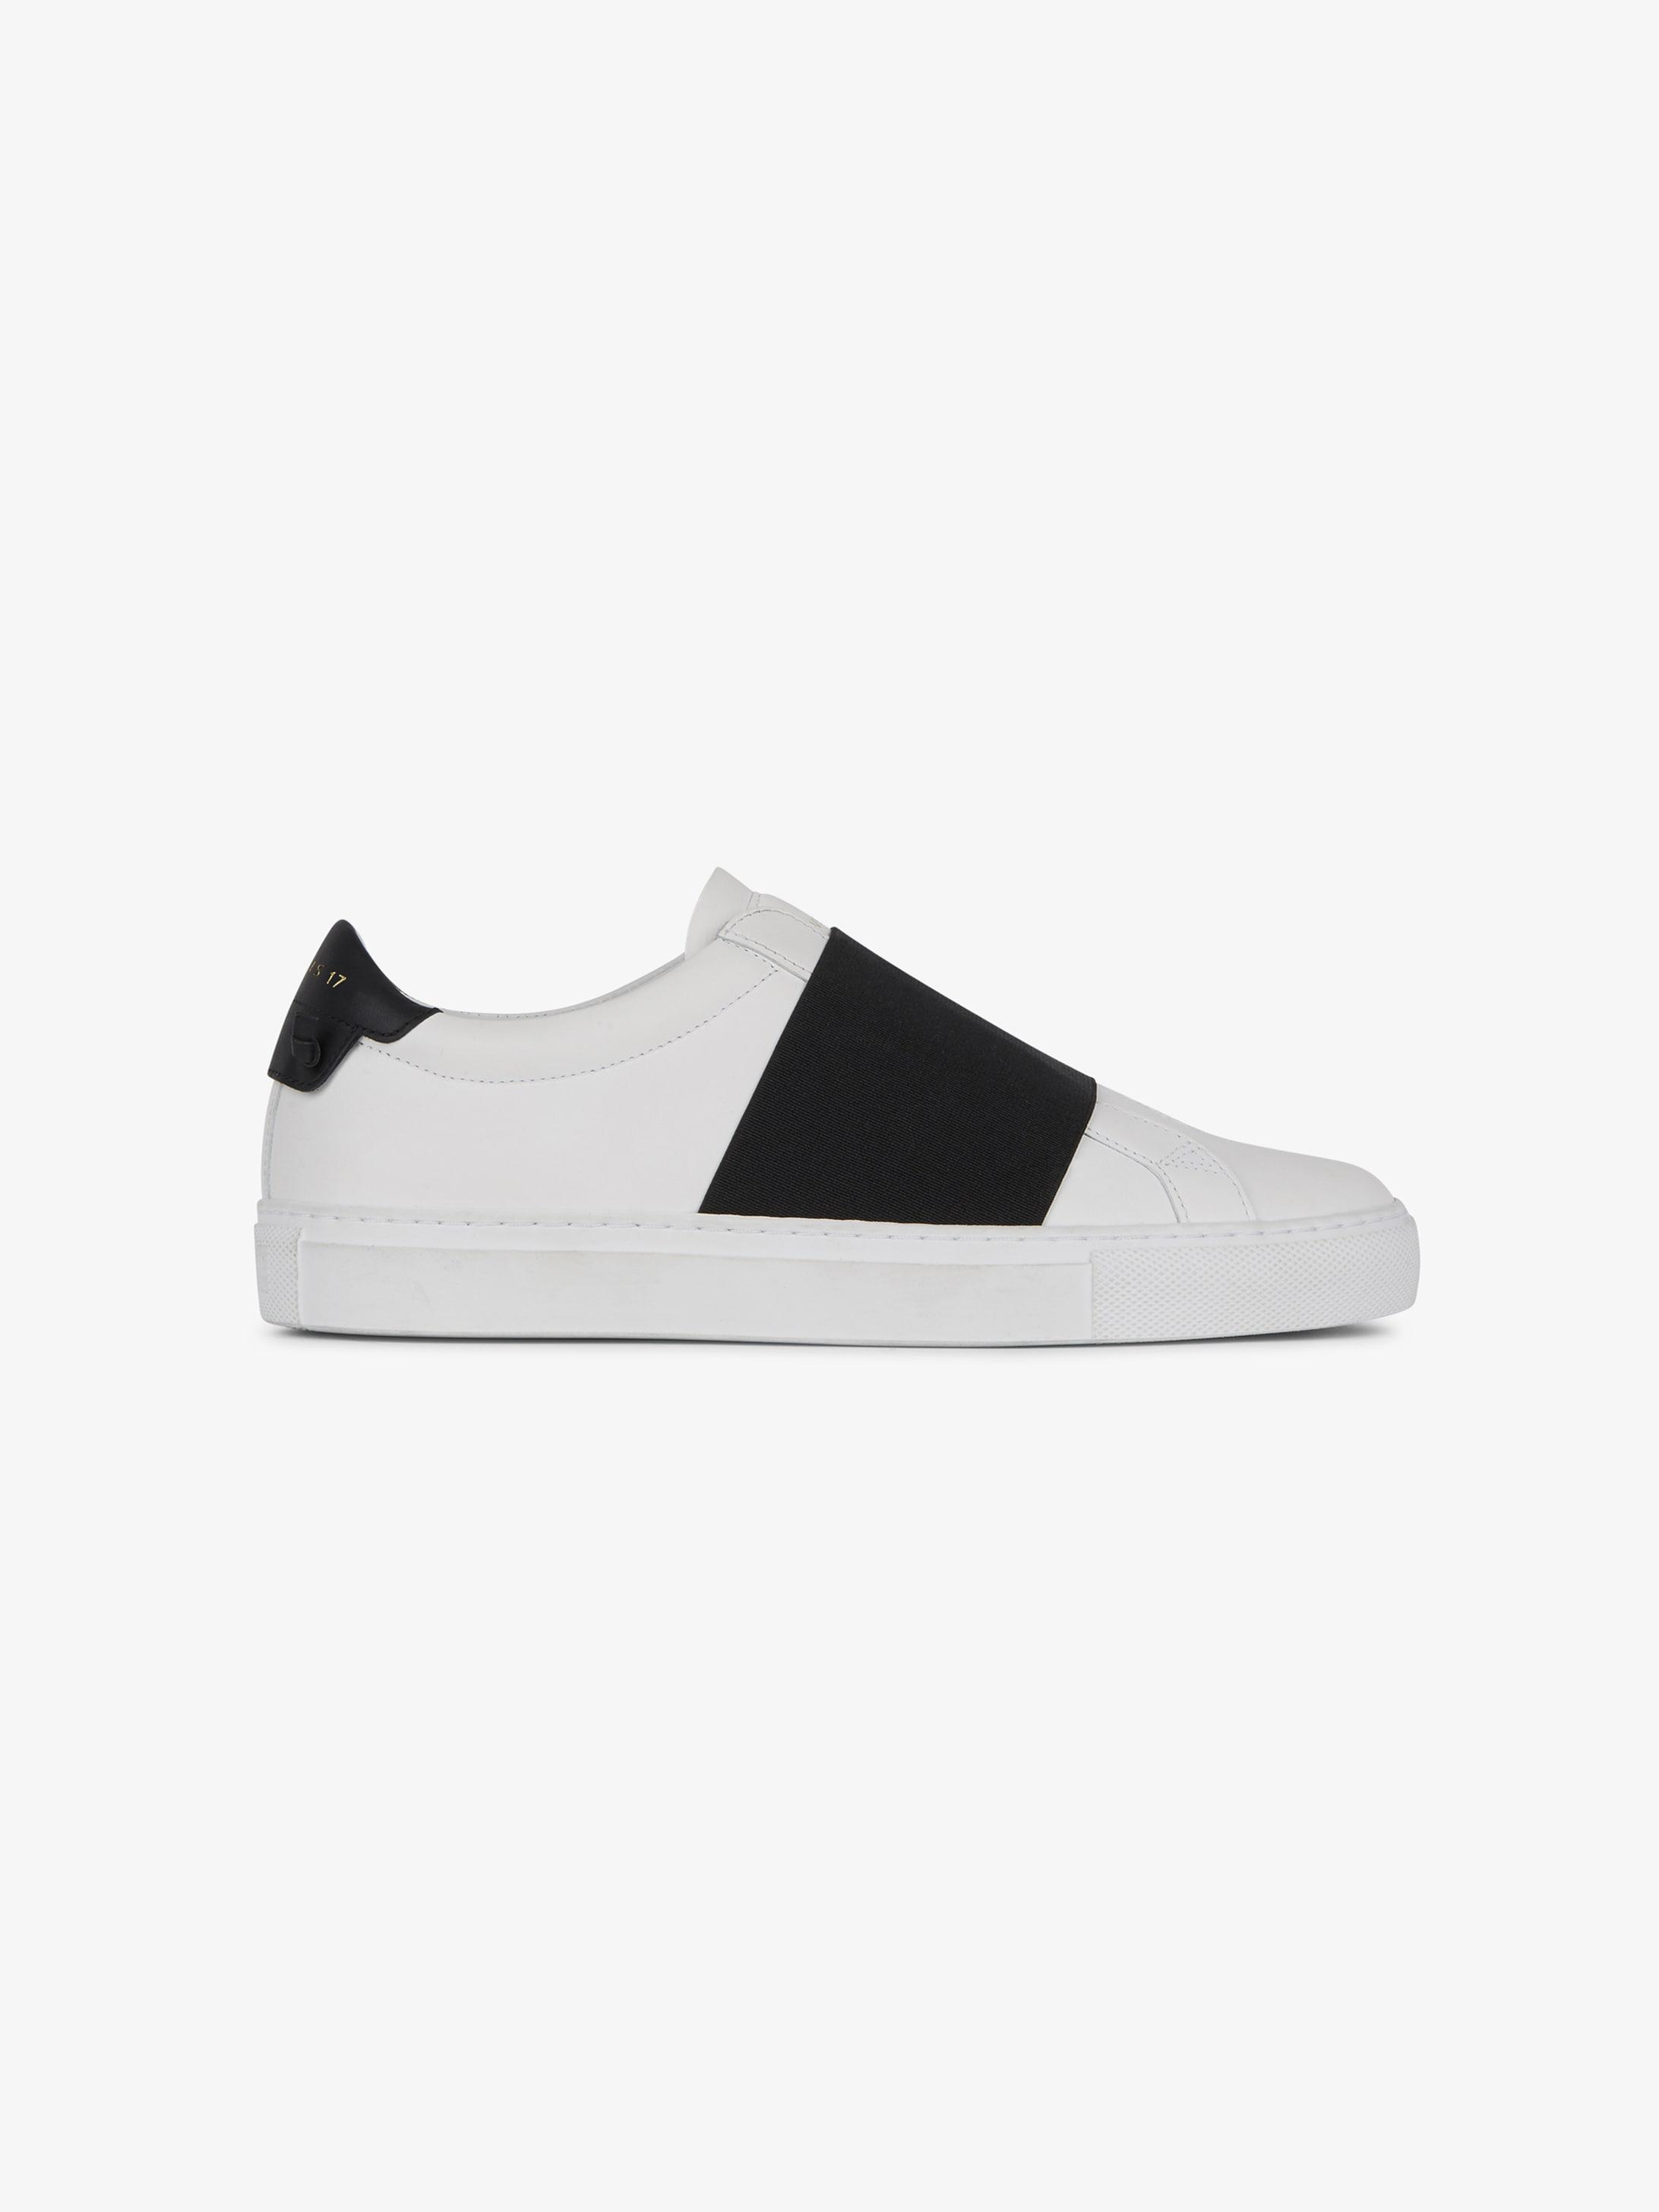 Sneaker Urban Street in pelle con fascia elastica